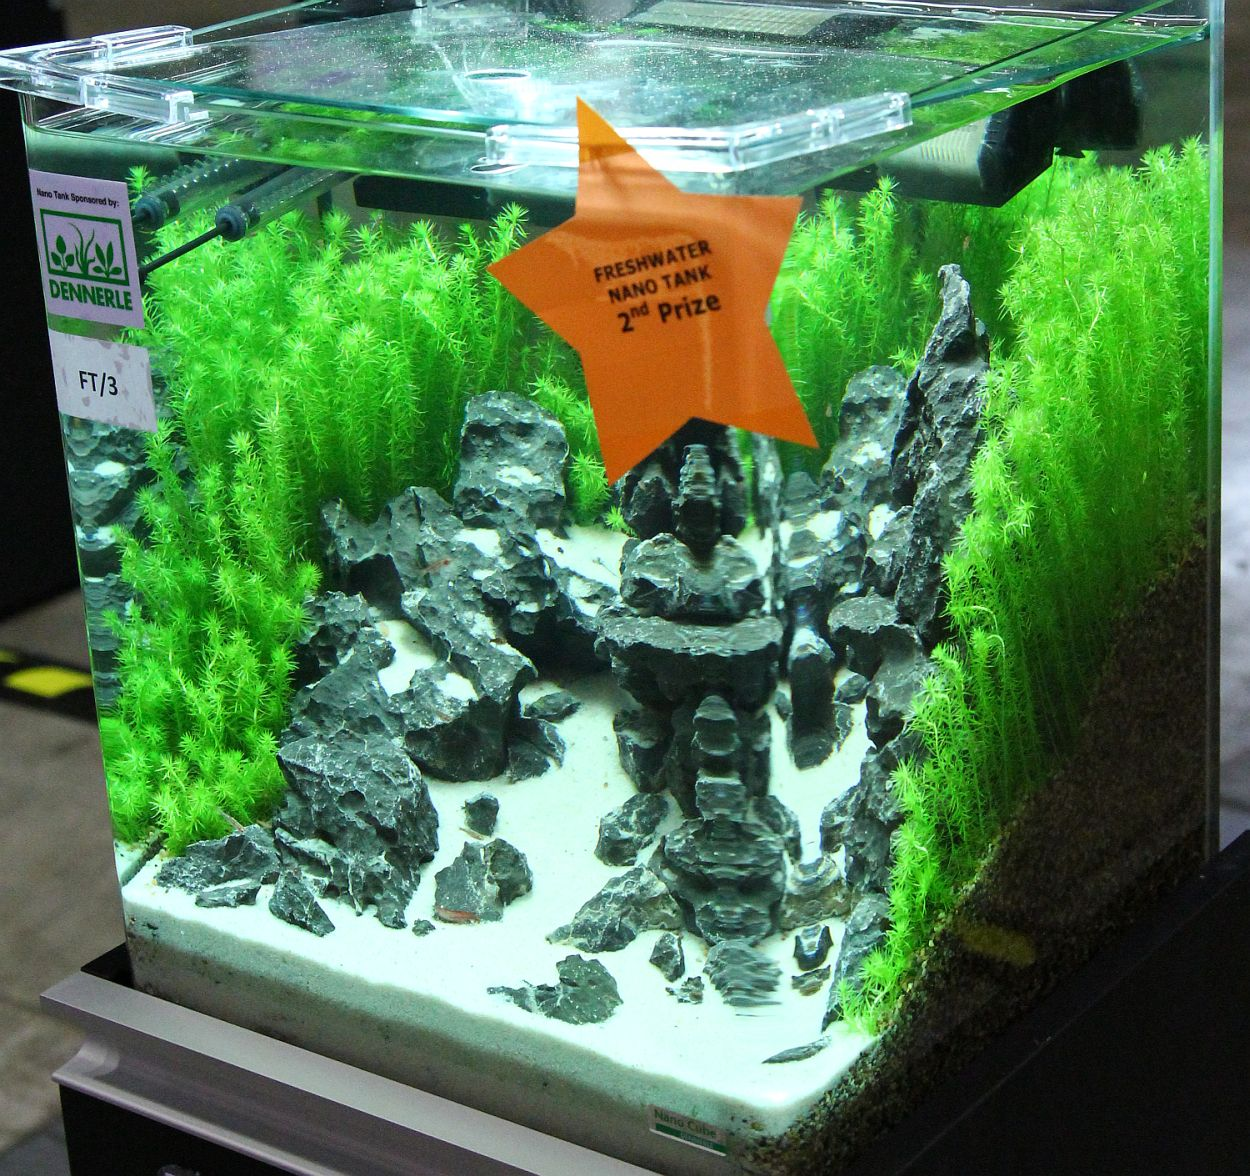 Freshwater aquarium fish nano - Freshwater Nano Tank 2nd Prize